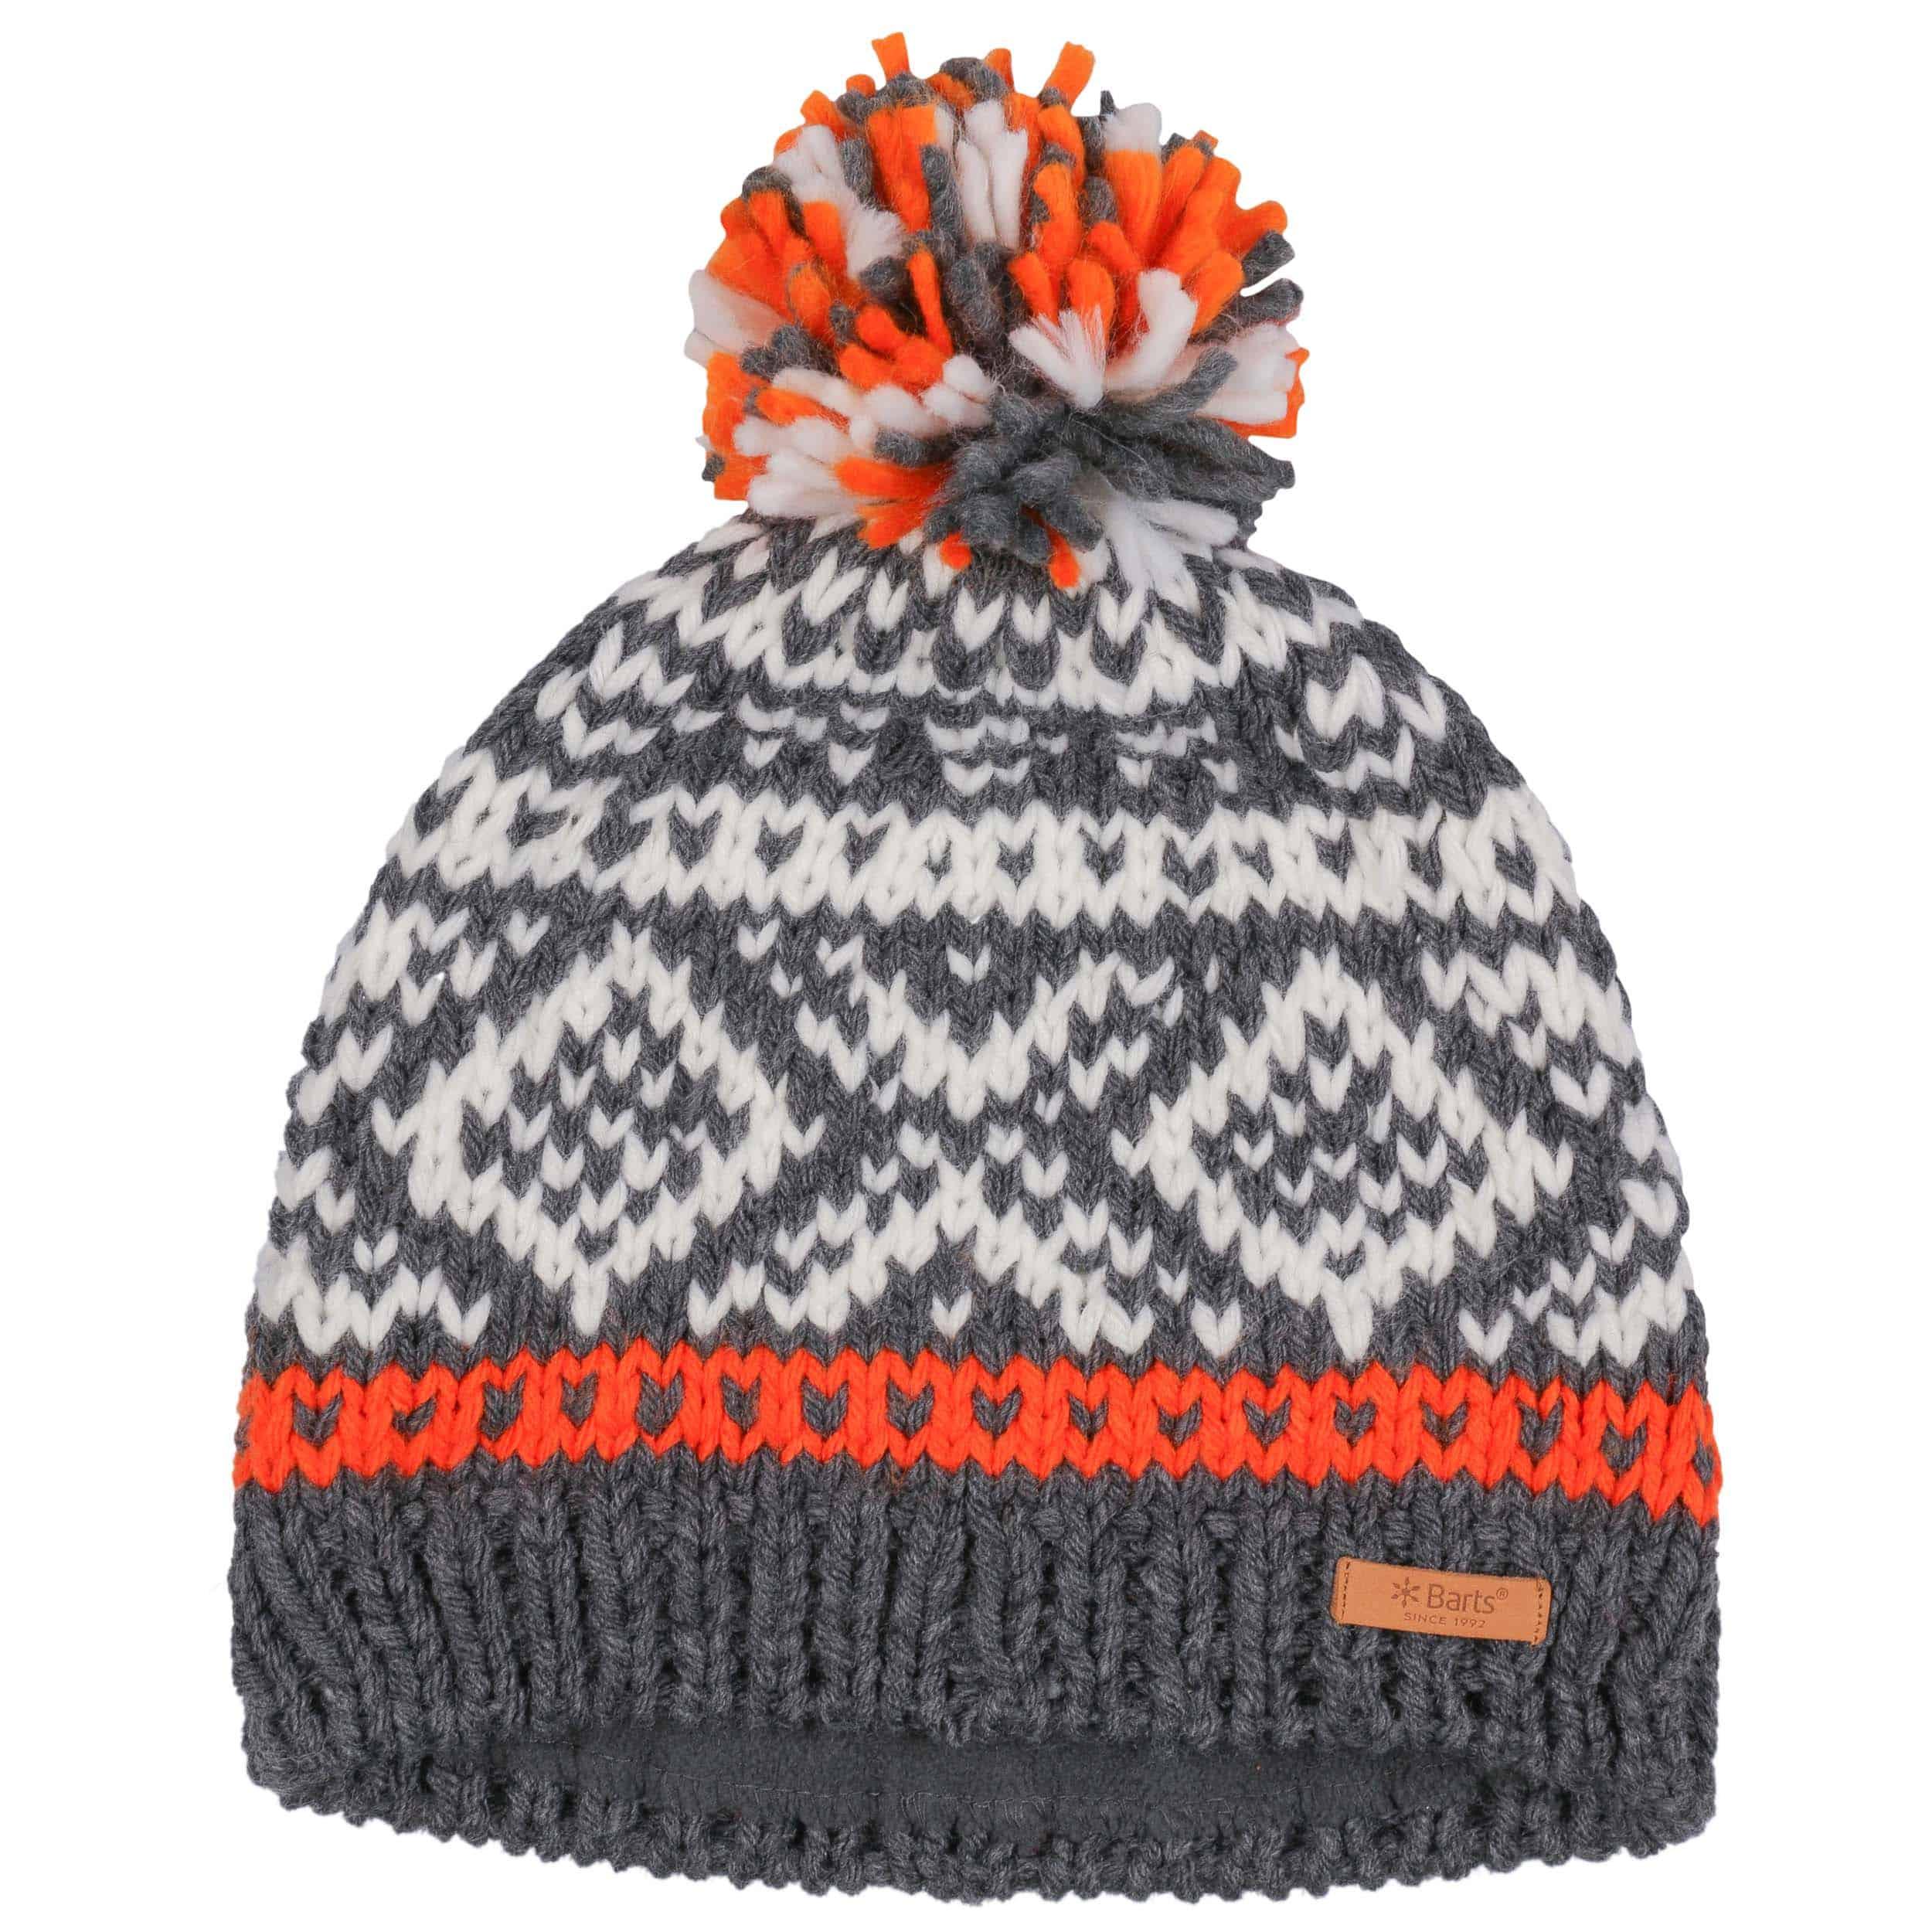 84ad83c772d Log Cabin Pompom Hat by Barts - anthracite 1 ...